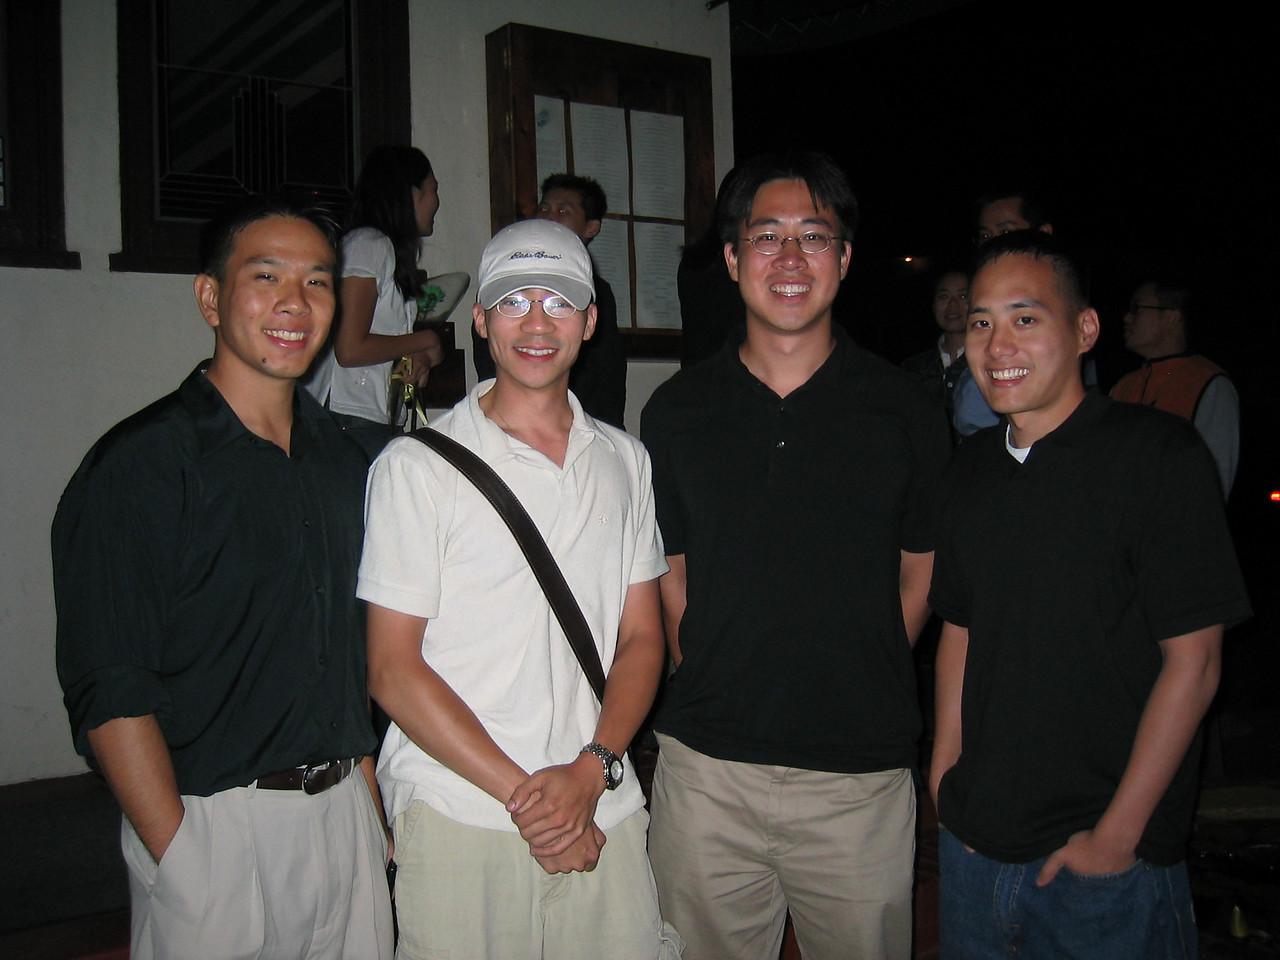 2003 09 05 Friday - Joe Chen, Ben Yu, Stephen Chang, Jimmy Chen